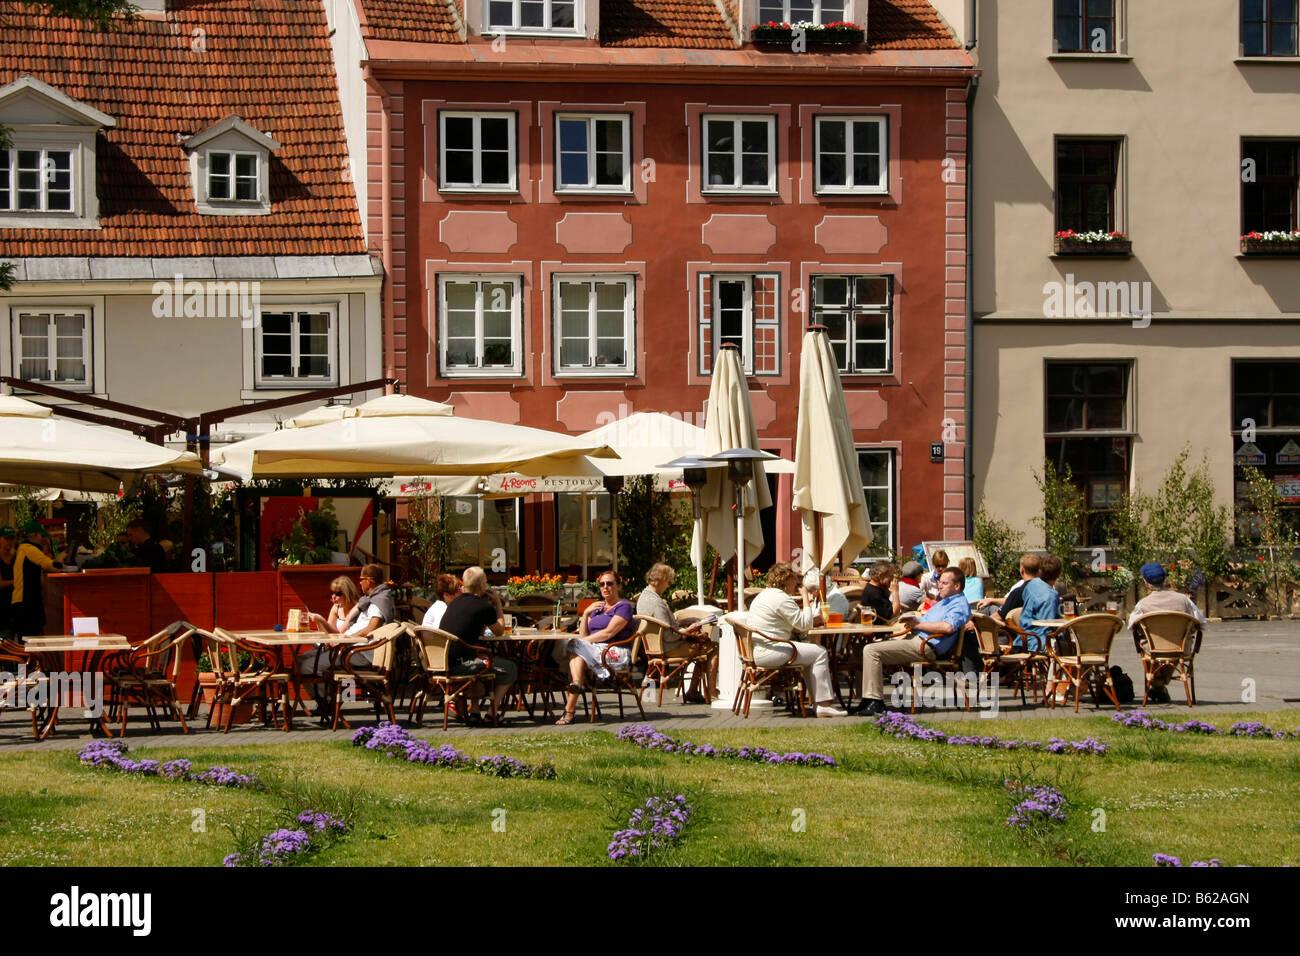 Strret café in the historic city centre of Riga, Latvia, Baltic region, Europe Stock Photo